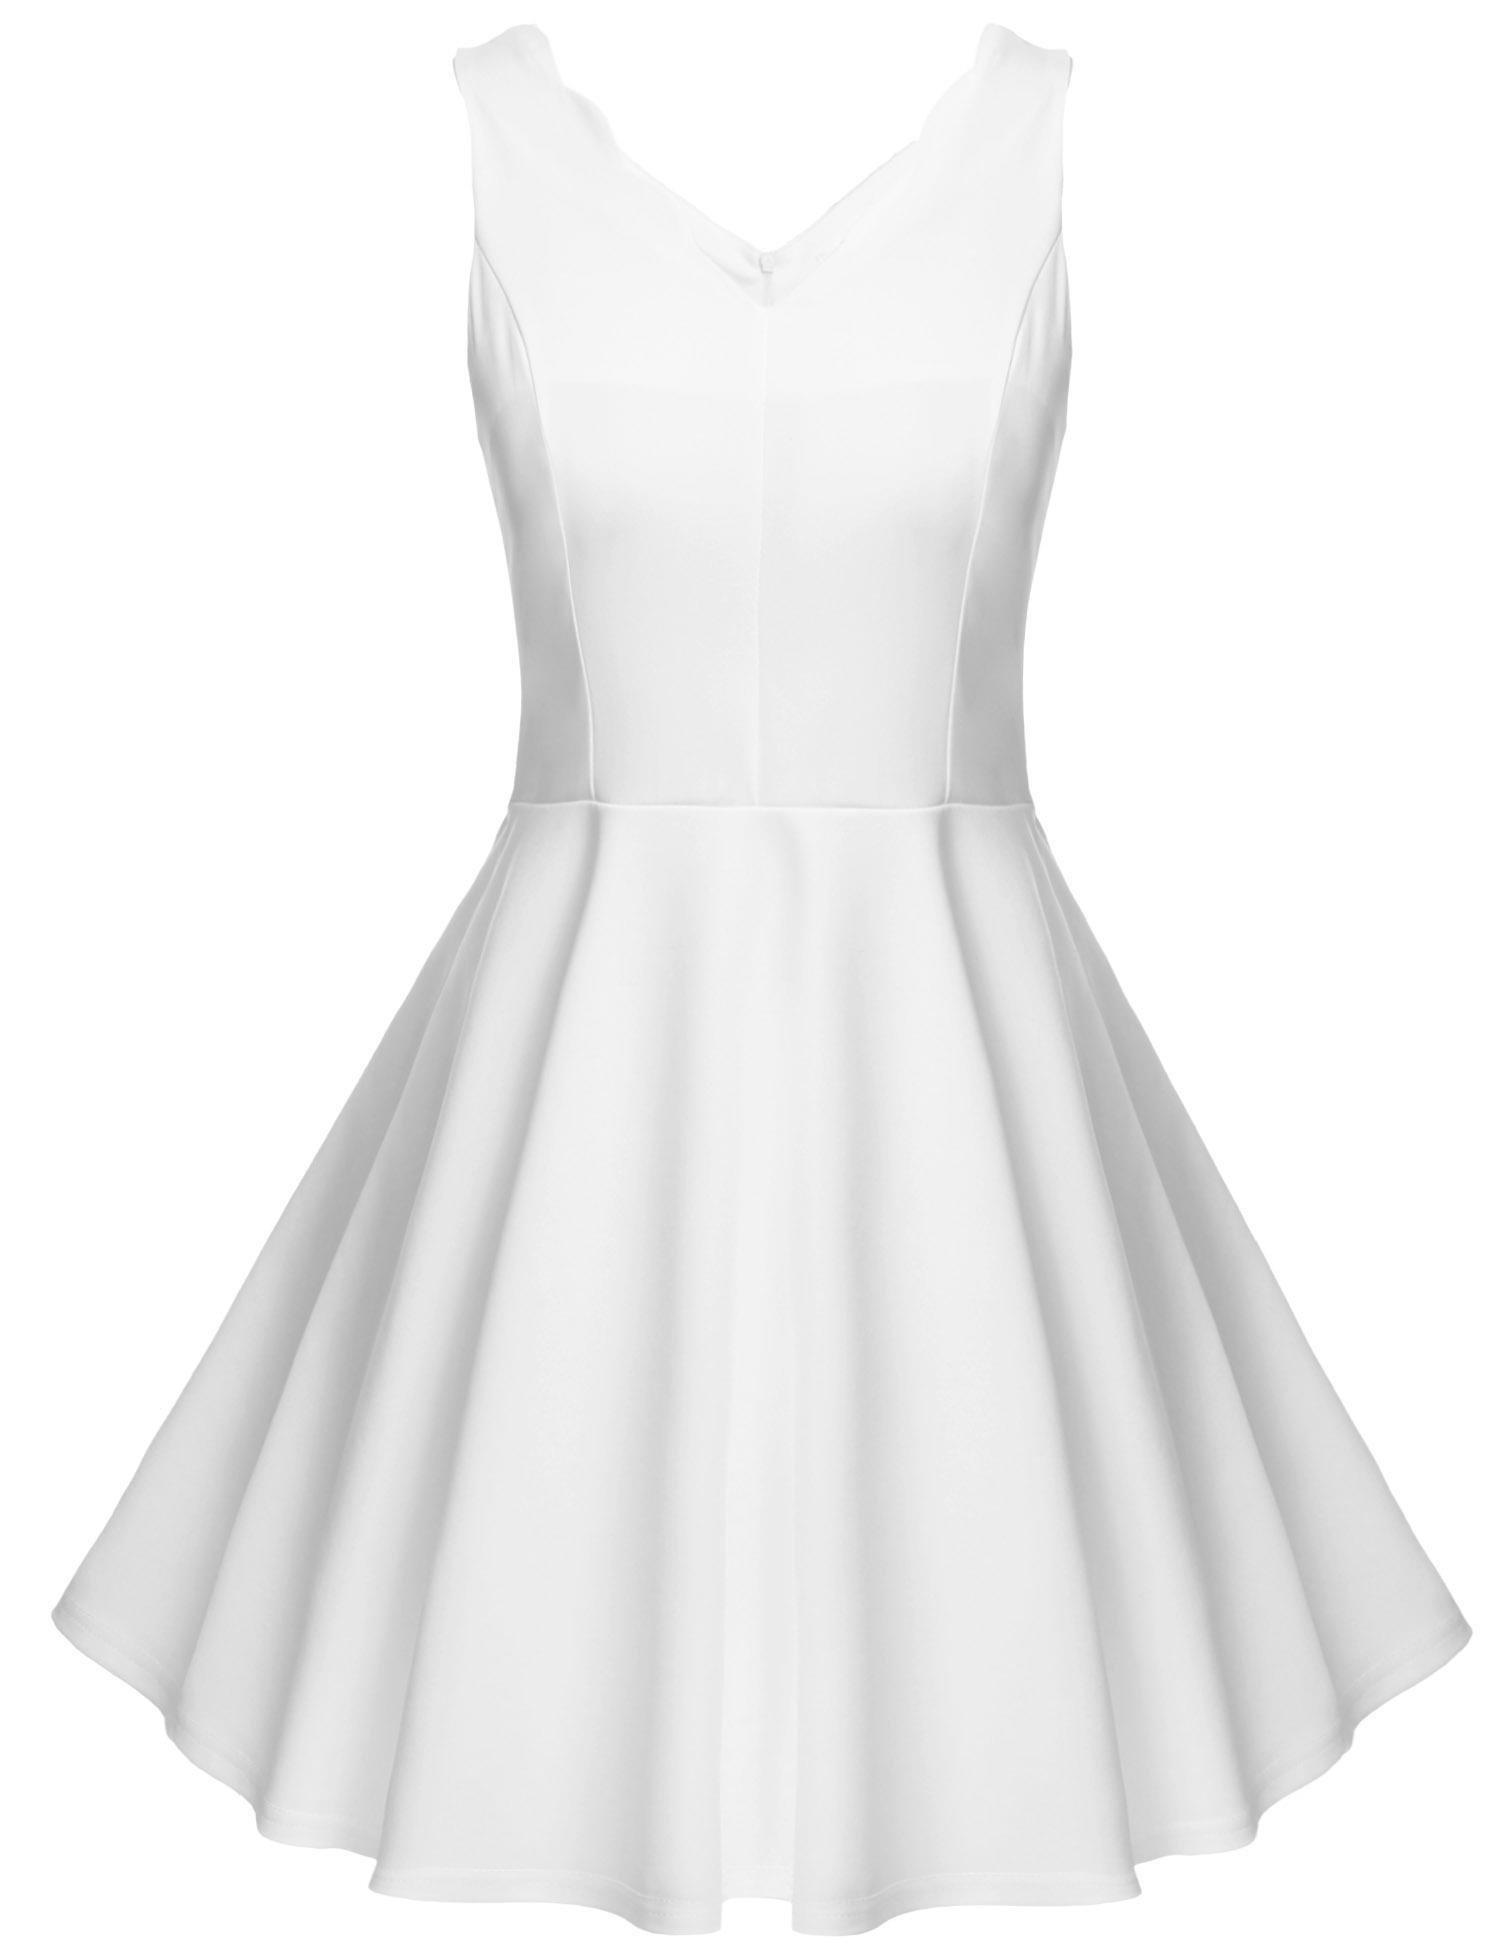 Meaneor Women Cocktail Dress Sleeveless Flare Garden Party Beach Mini Dress,White/XL